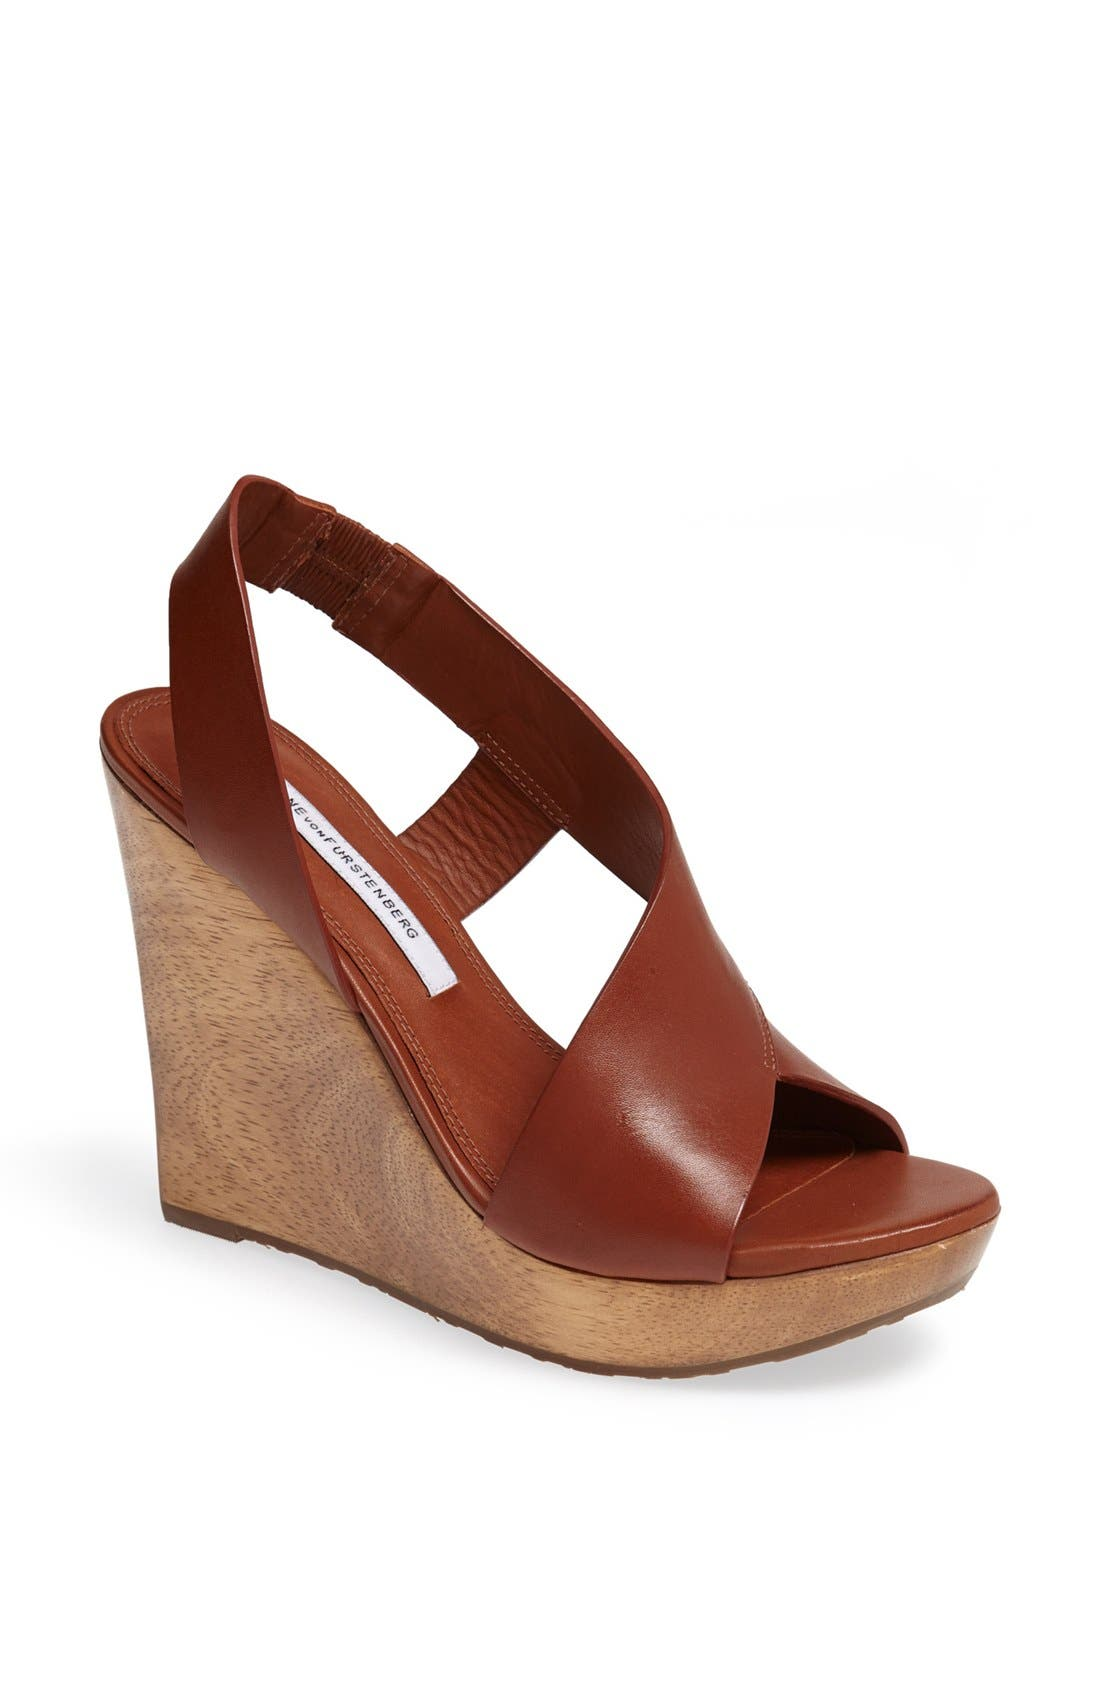 Main Image - Diane von Furstenberg 'Sunny' Wedge Sandal